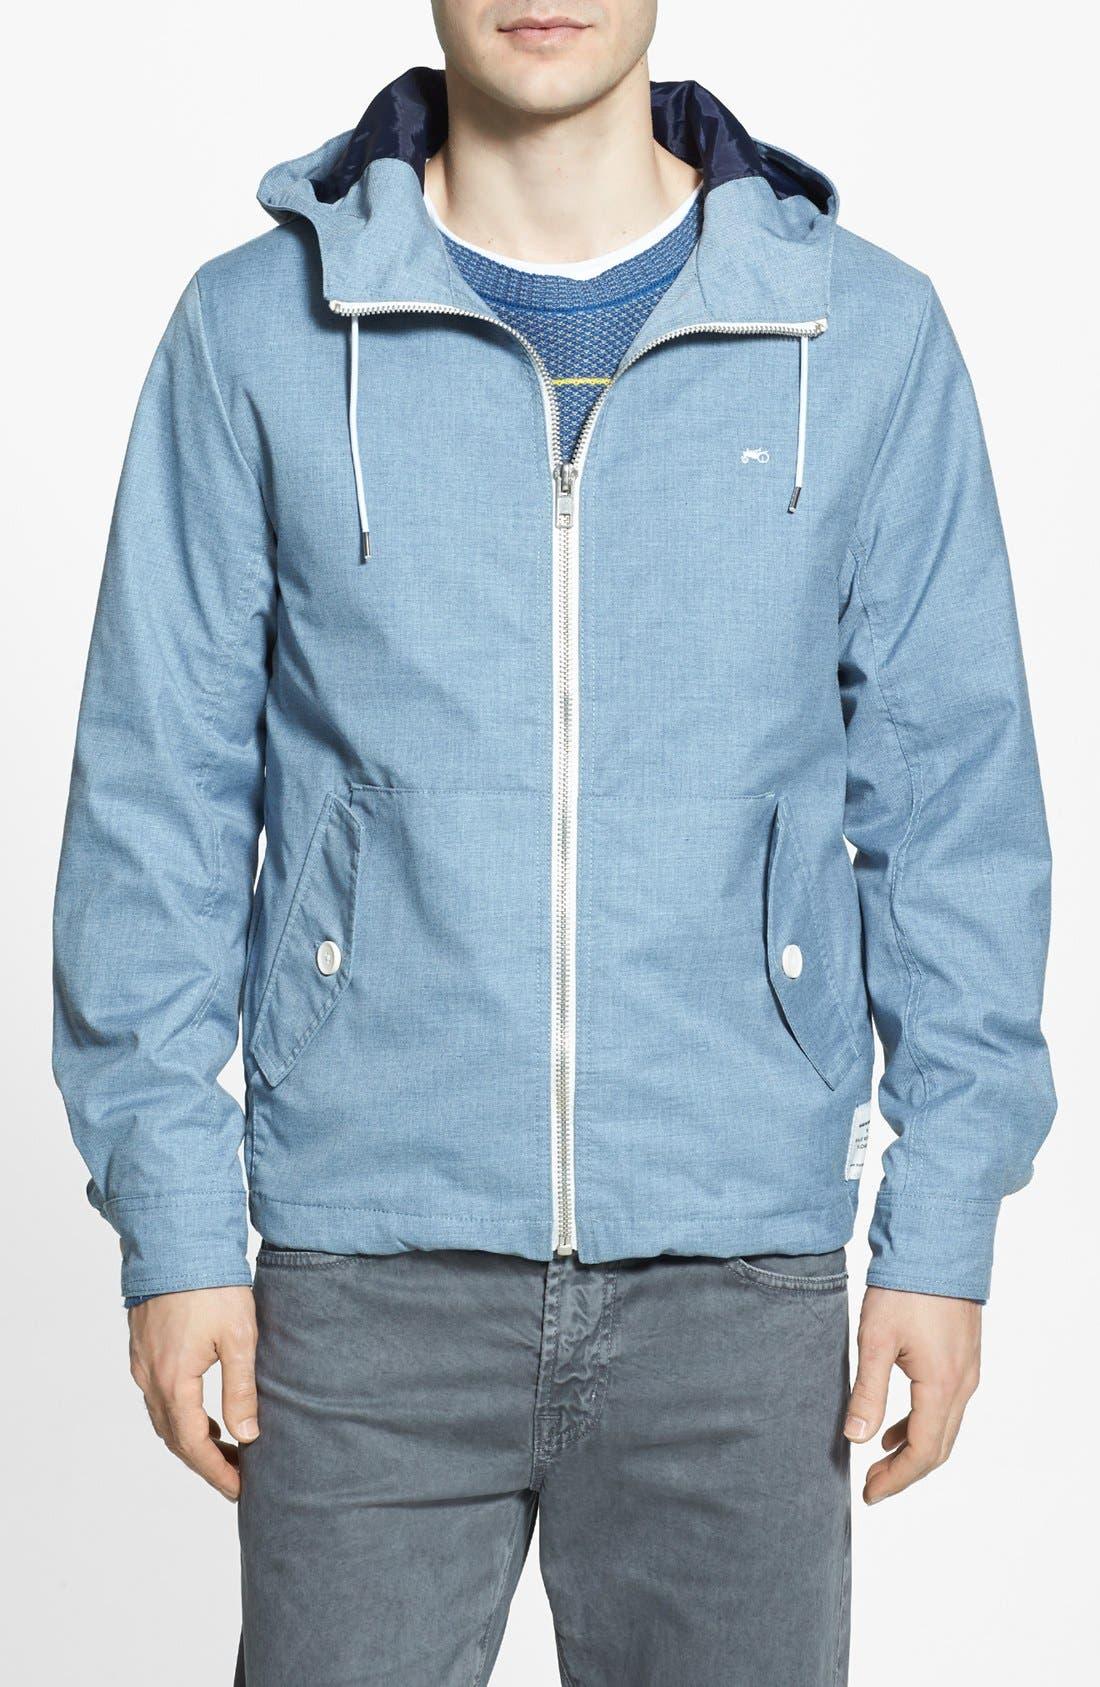 Main Image - Moods of Norway 'Jon Andre' Cotton Zip Jacket